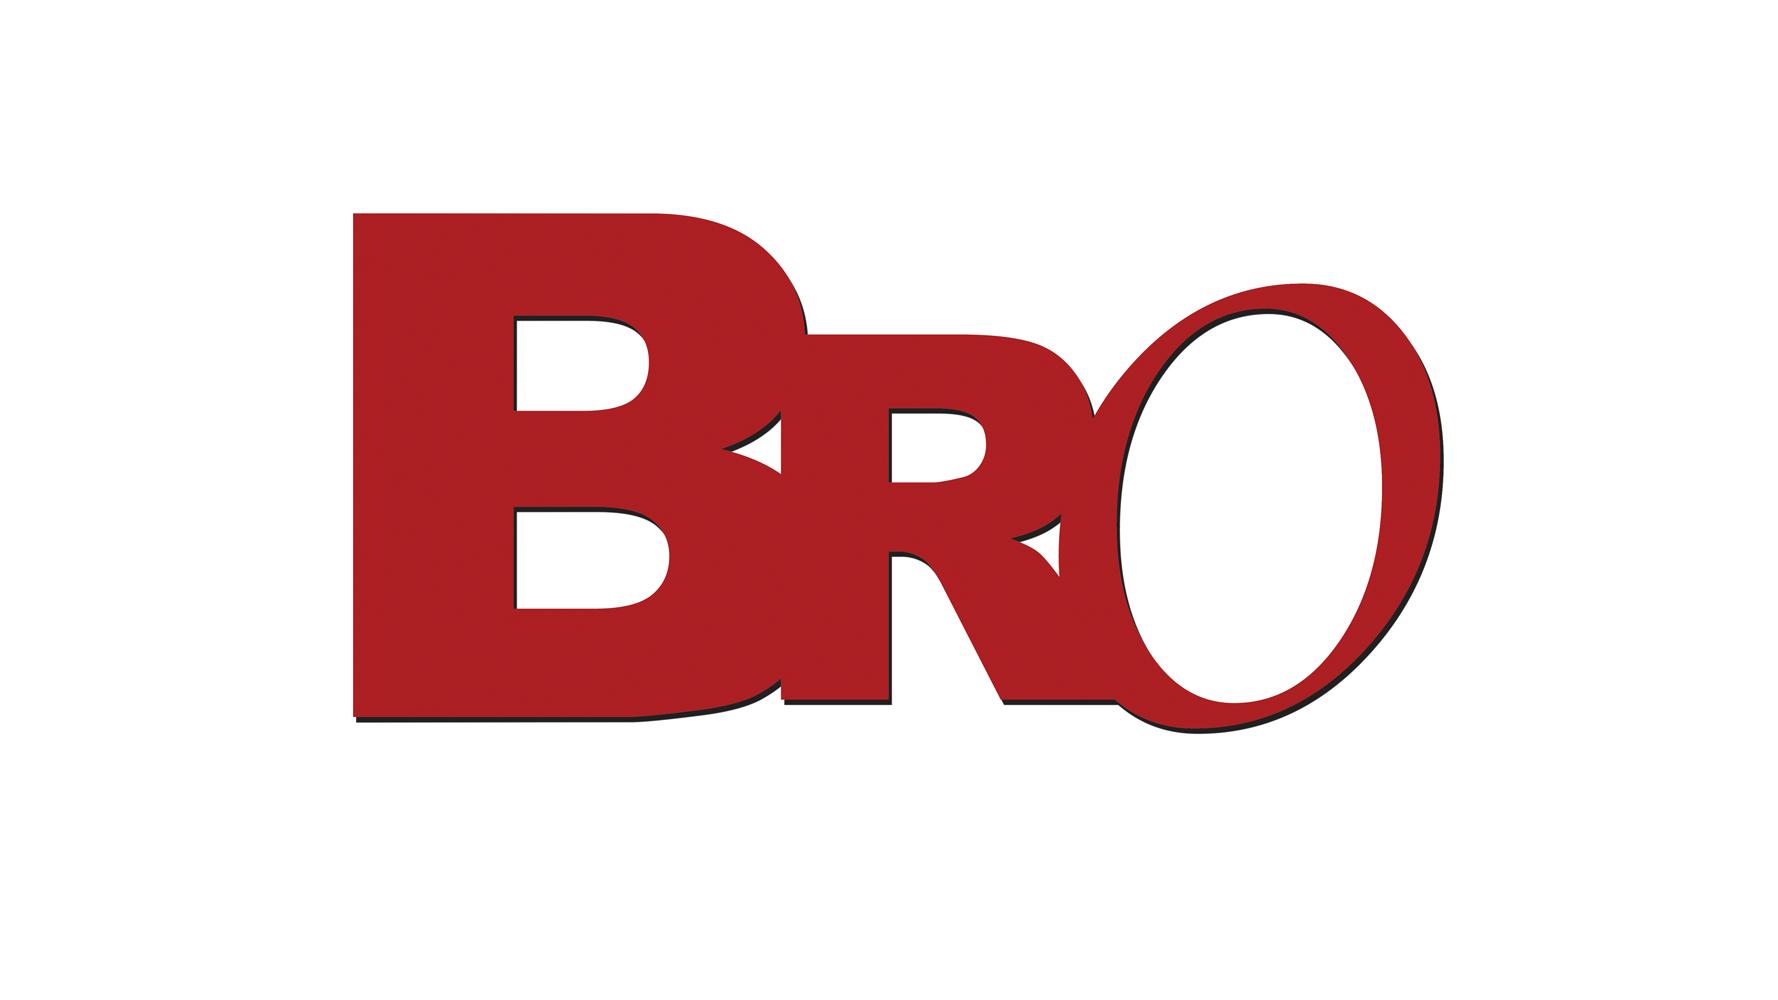 Bro png 1 » PNG Image.